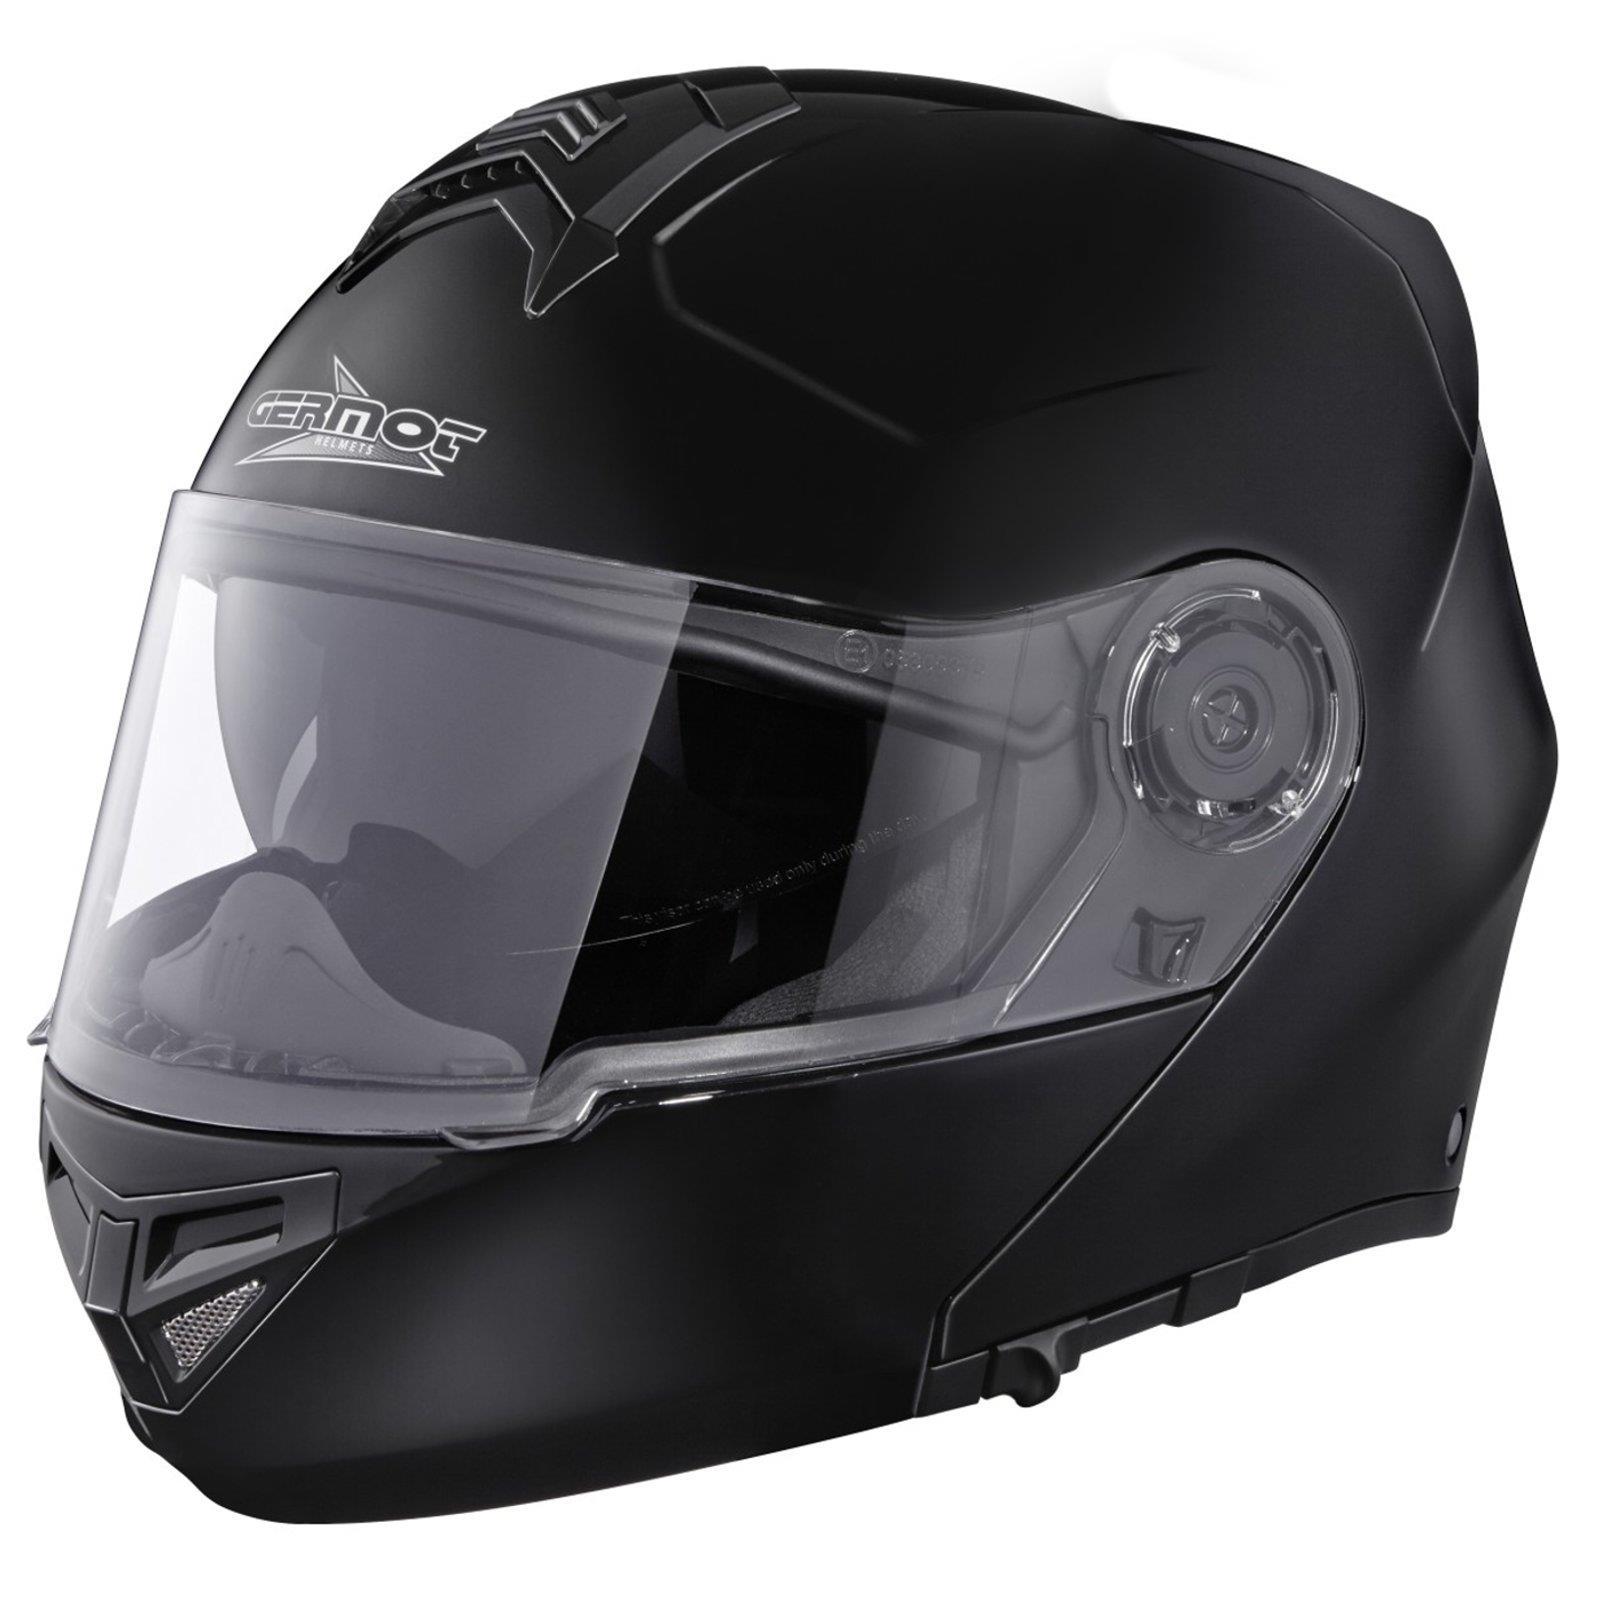 Germot GM 940 Klapp Helm schwarz Motorrad Integral